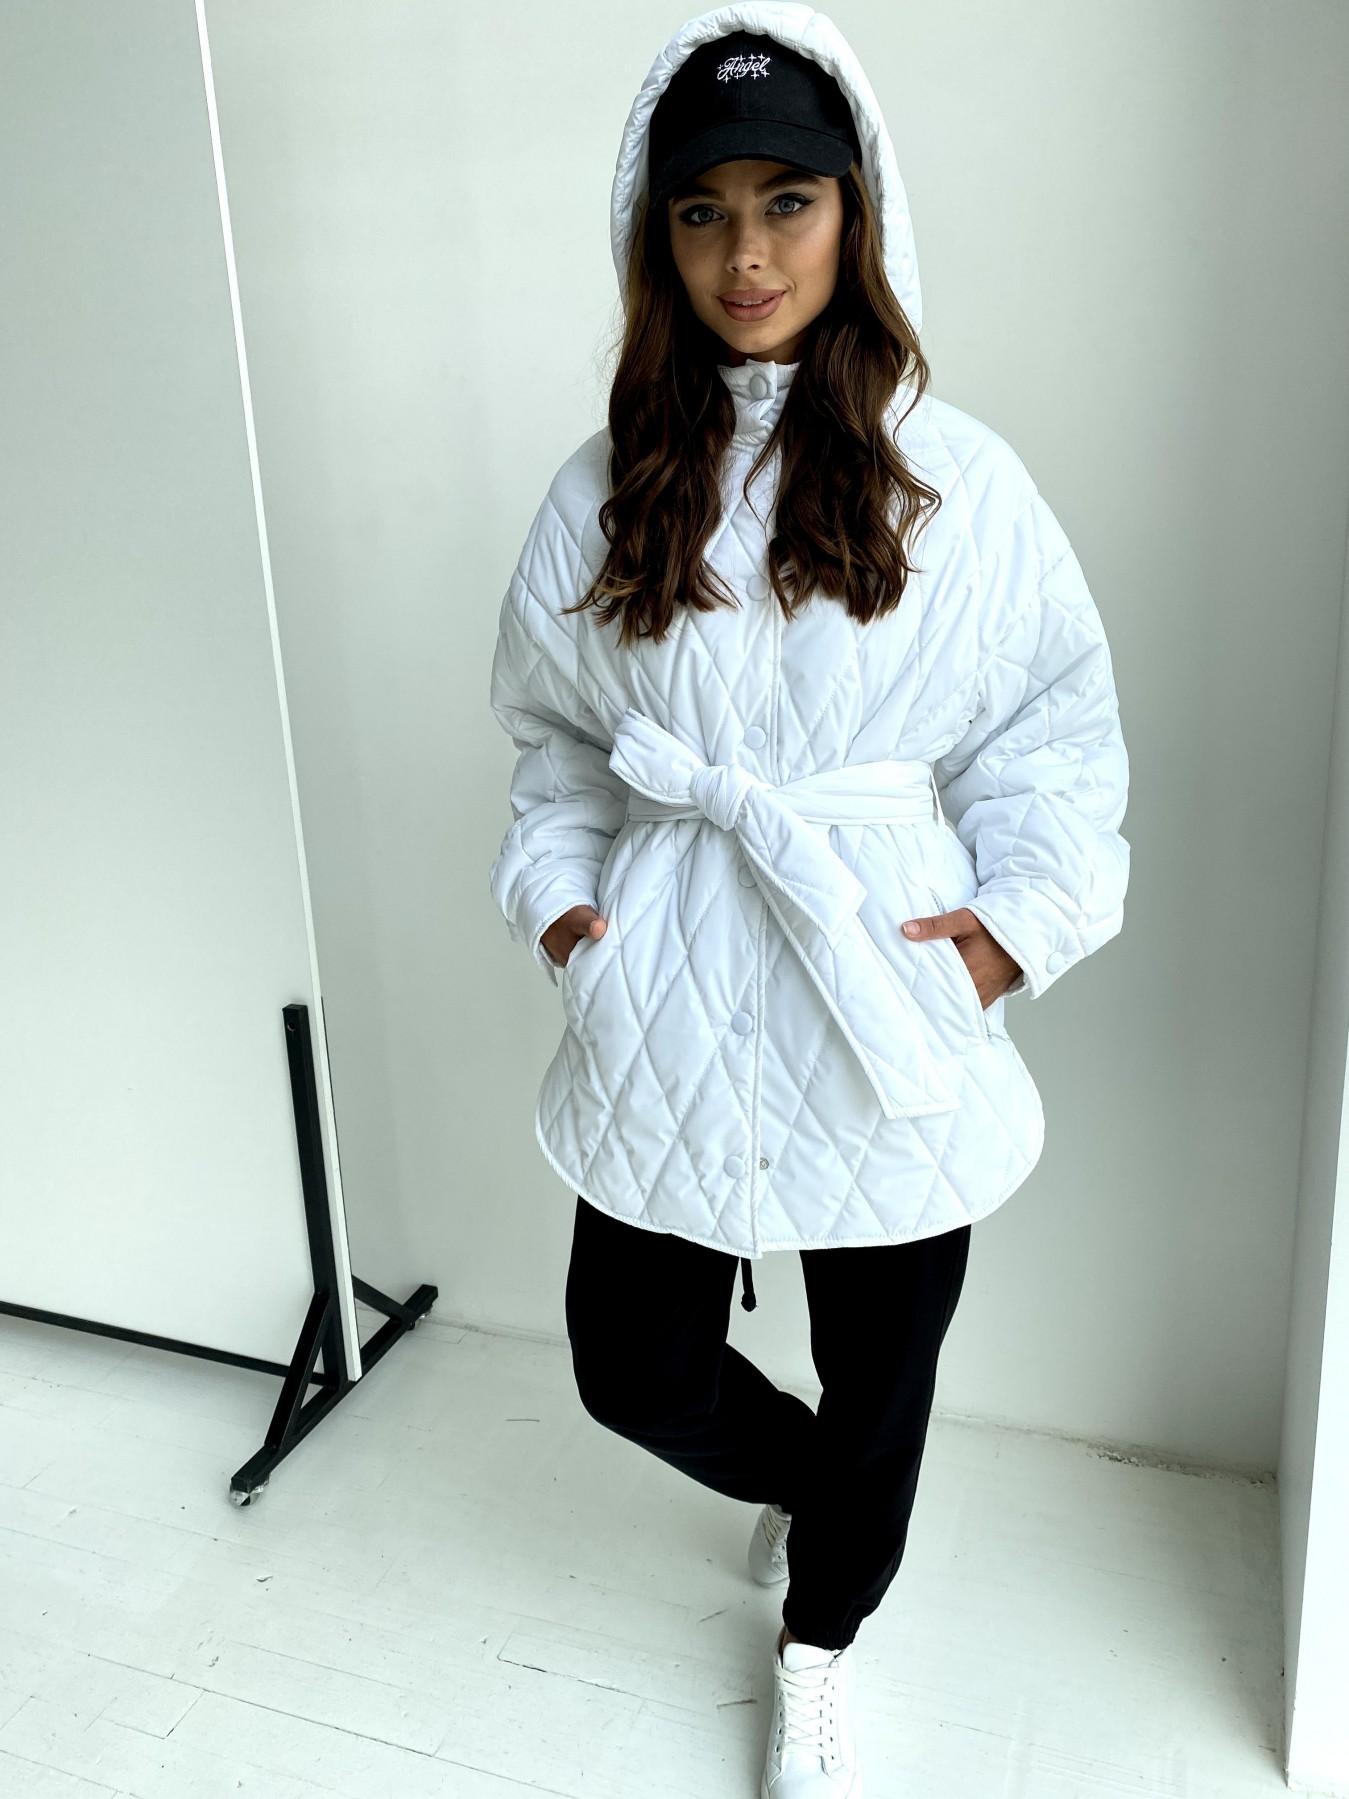 Пазл стеганая куртка из плащевки 11764 АРТ. 48509 Цвет: Молоко 12 - фото 3, интернет магазин tm-modus.ru